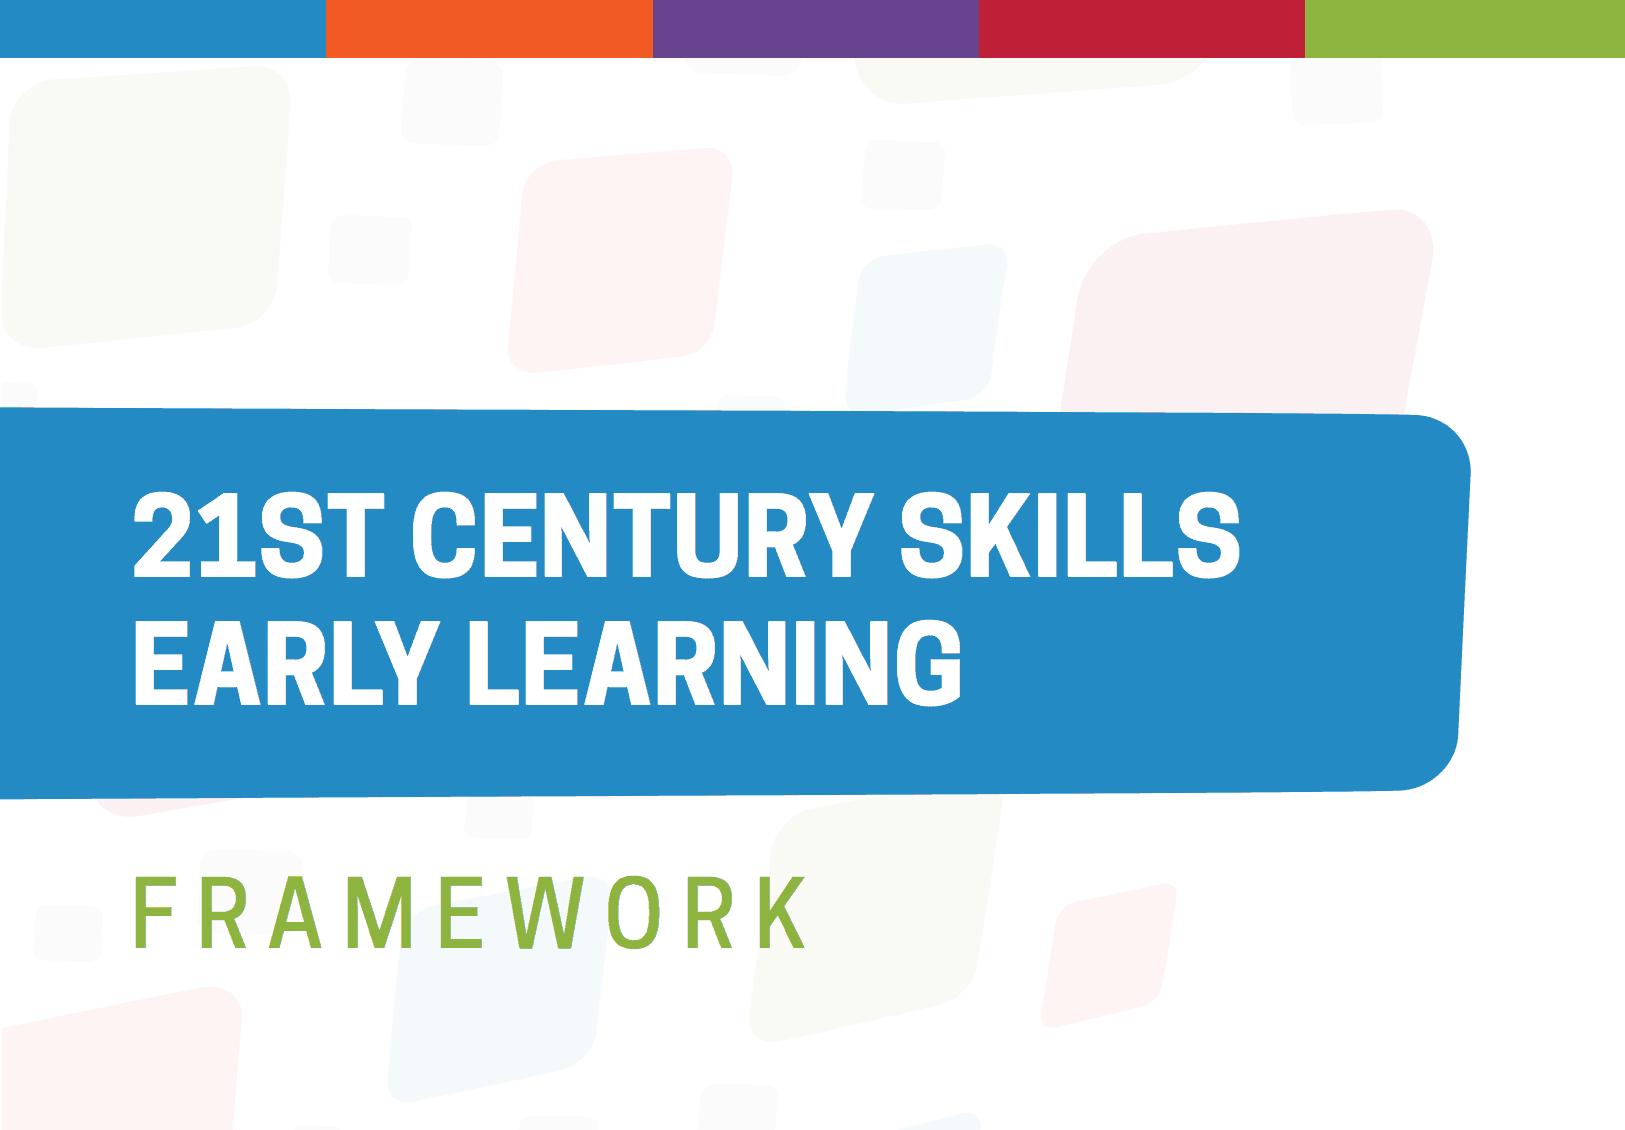 Helping Young Children Build 21st Century Skills